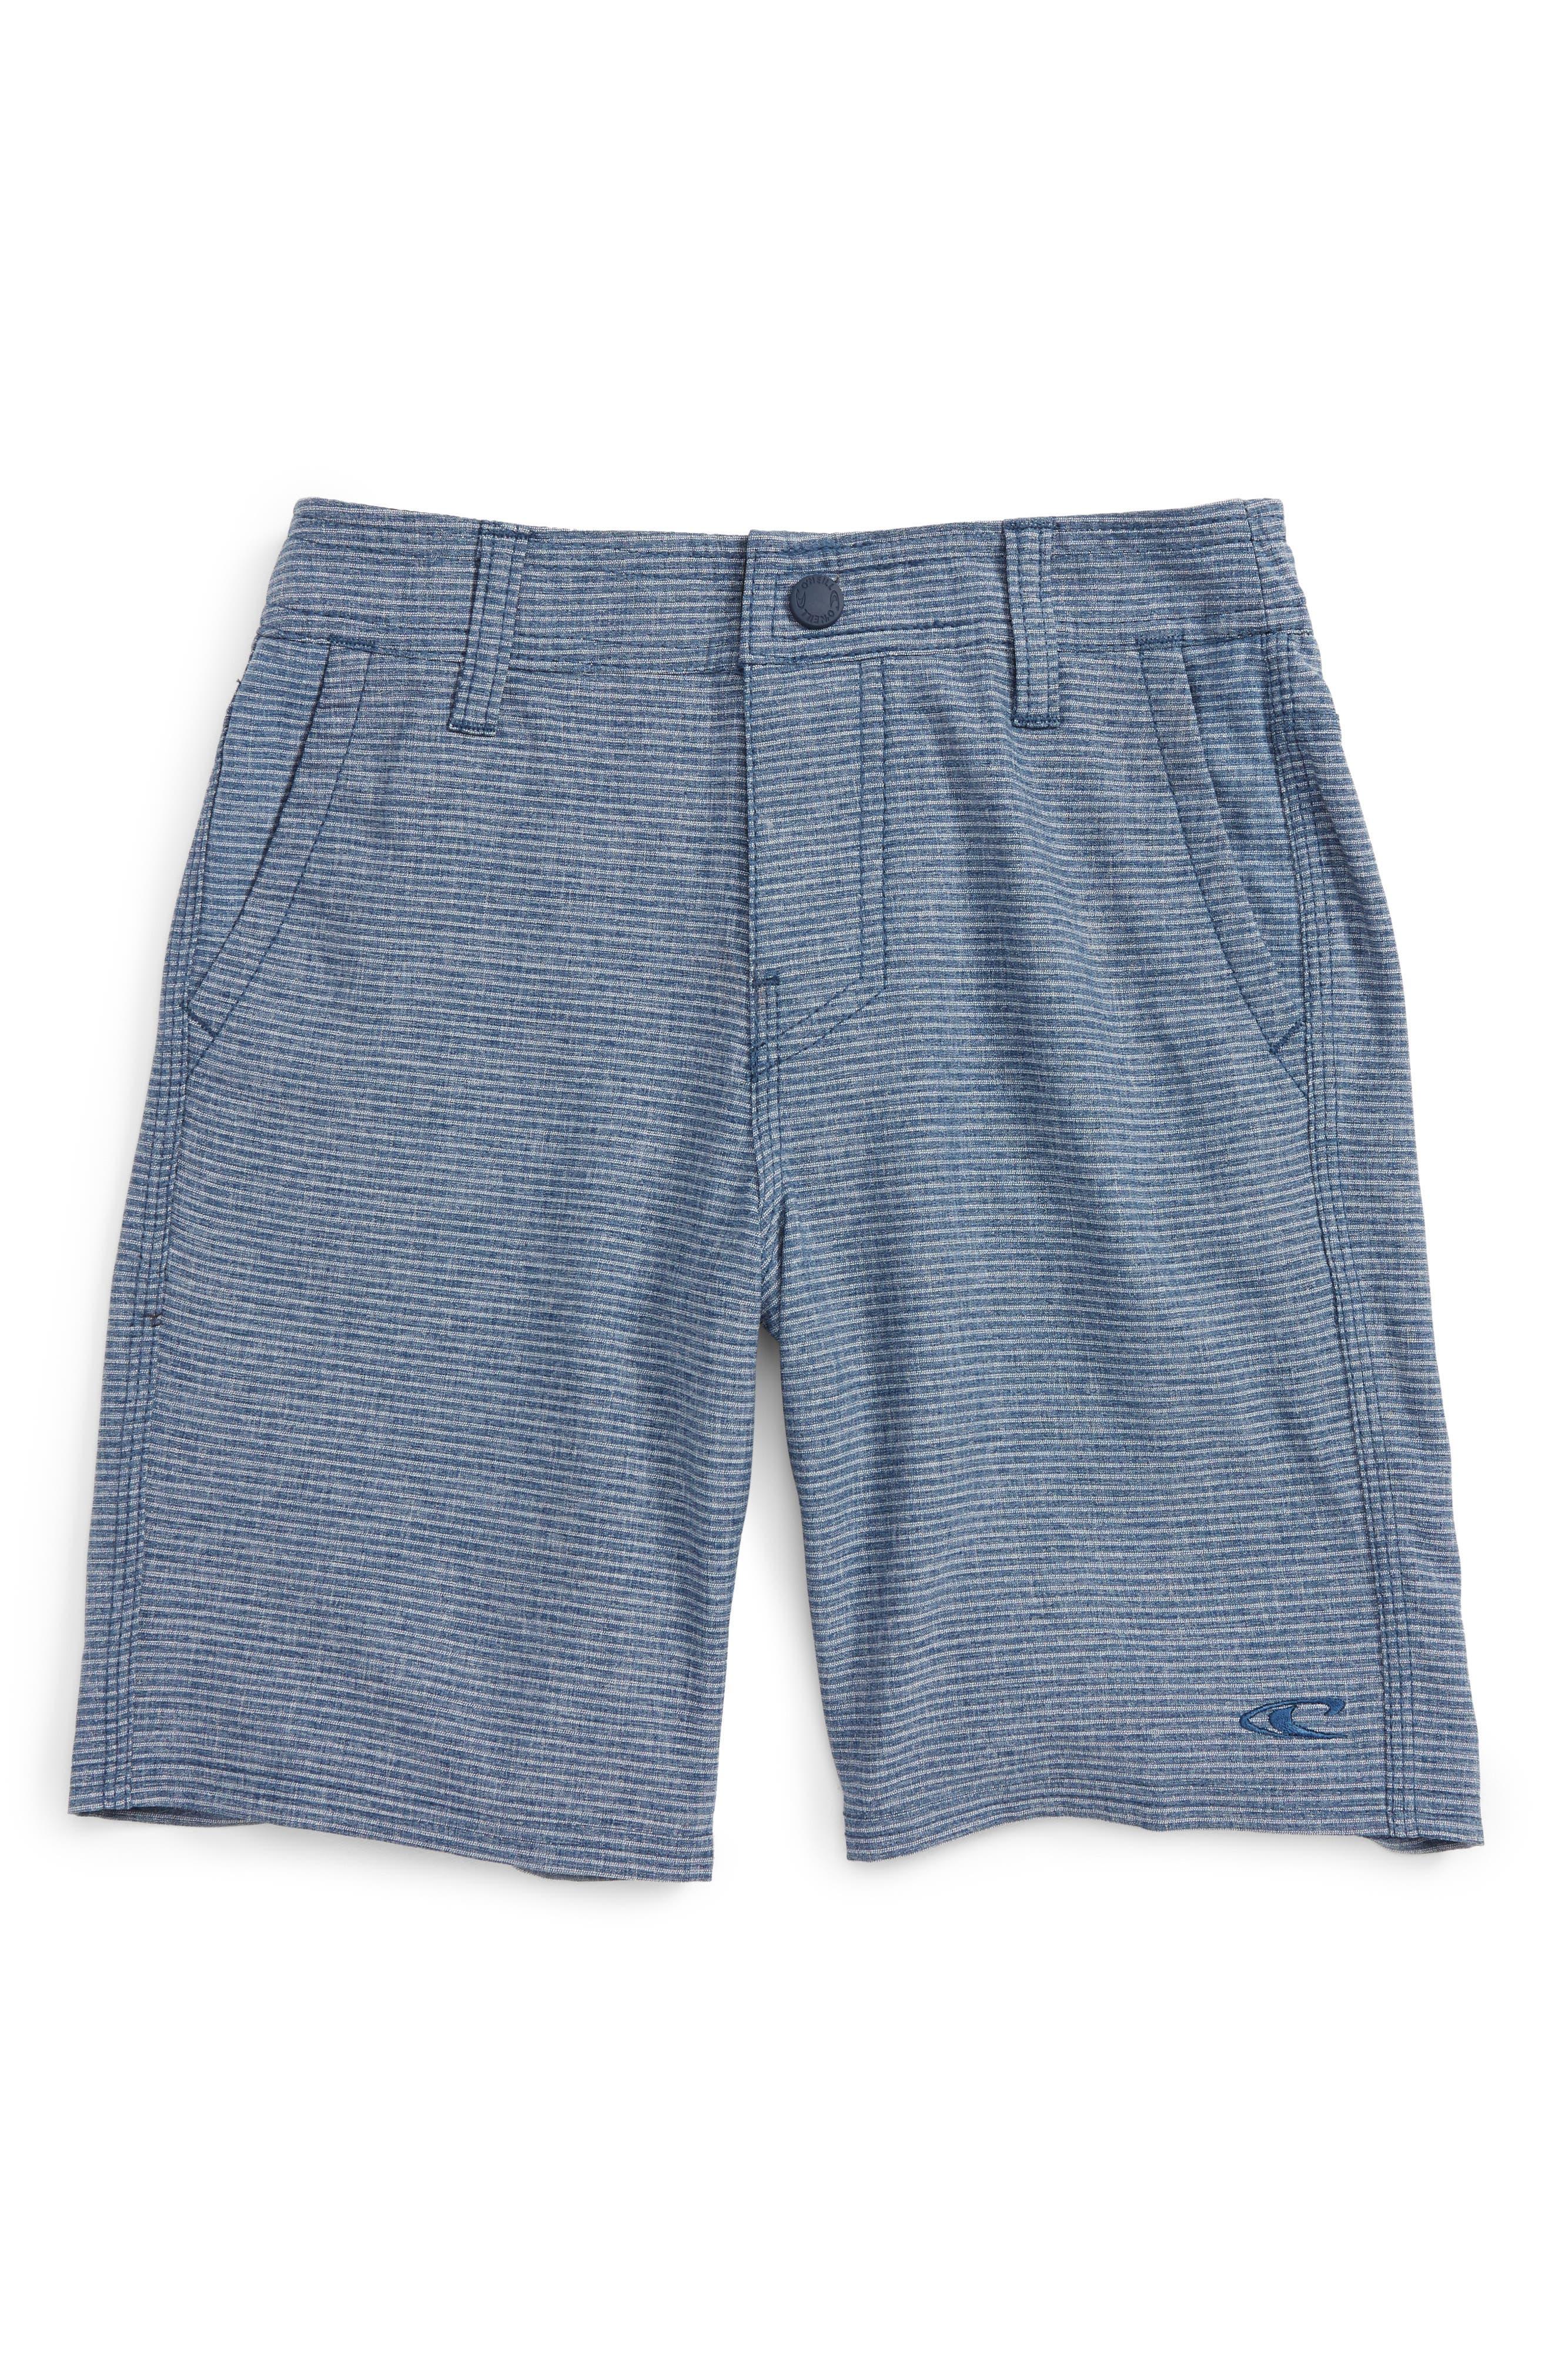 Main Image - O'Neill Locked Stripe Hybrid Shorts (Toddler Boys & Little Boys)